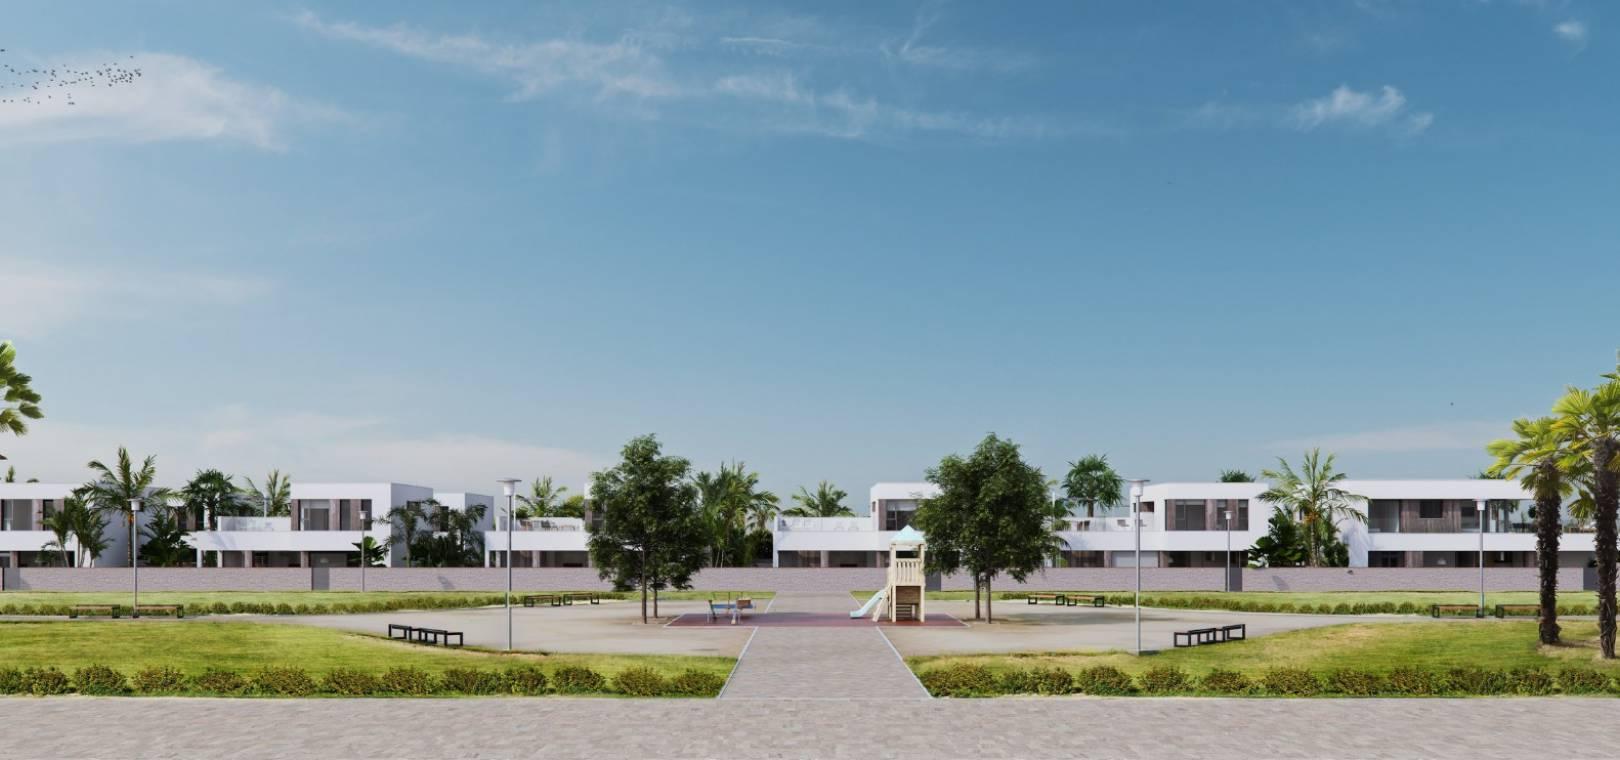 Torre_de_la_Horadada_New_Build_Luxury_Houses_For_Sale_nsp256_19